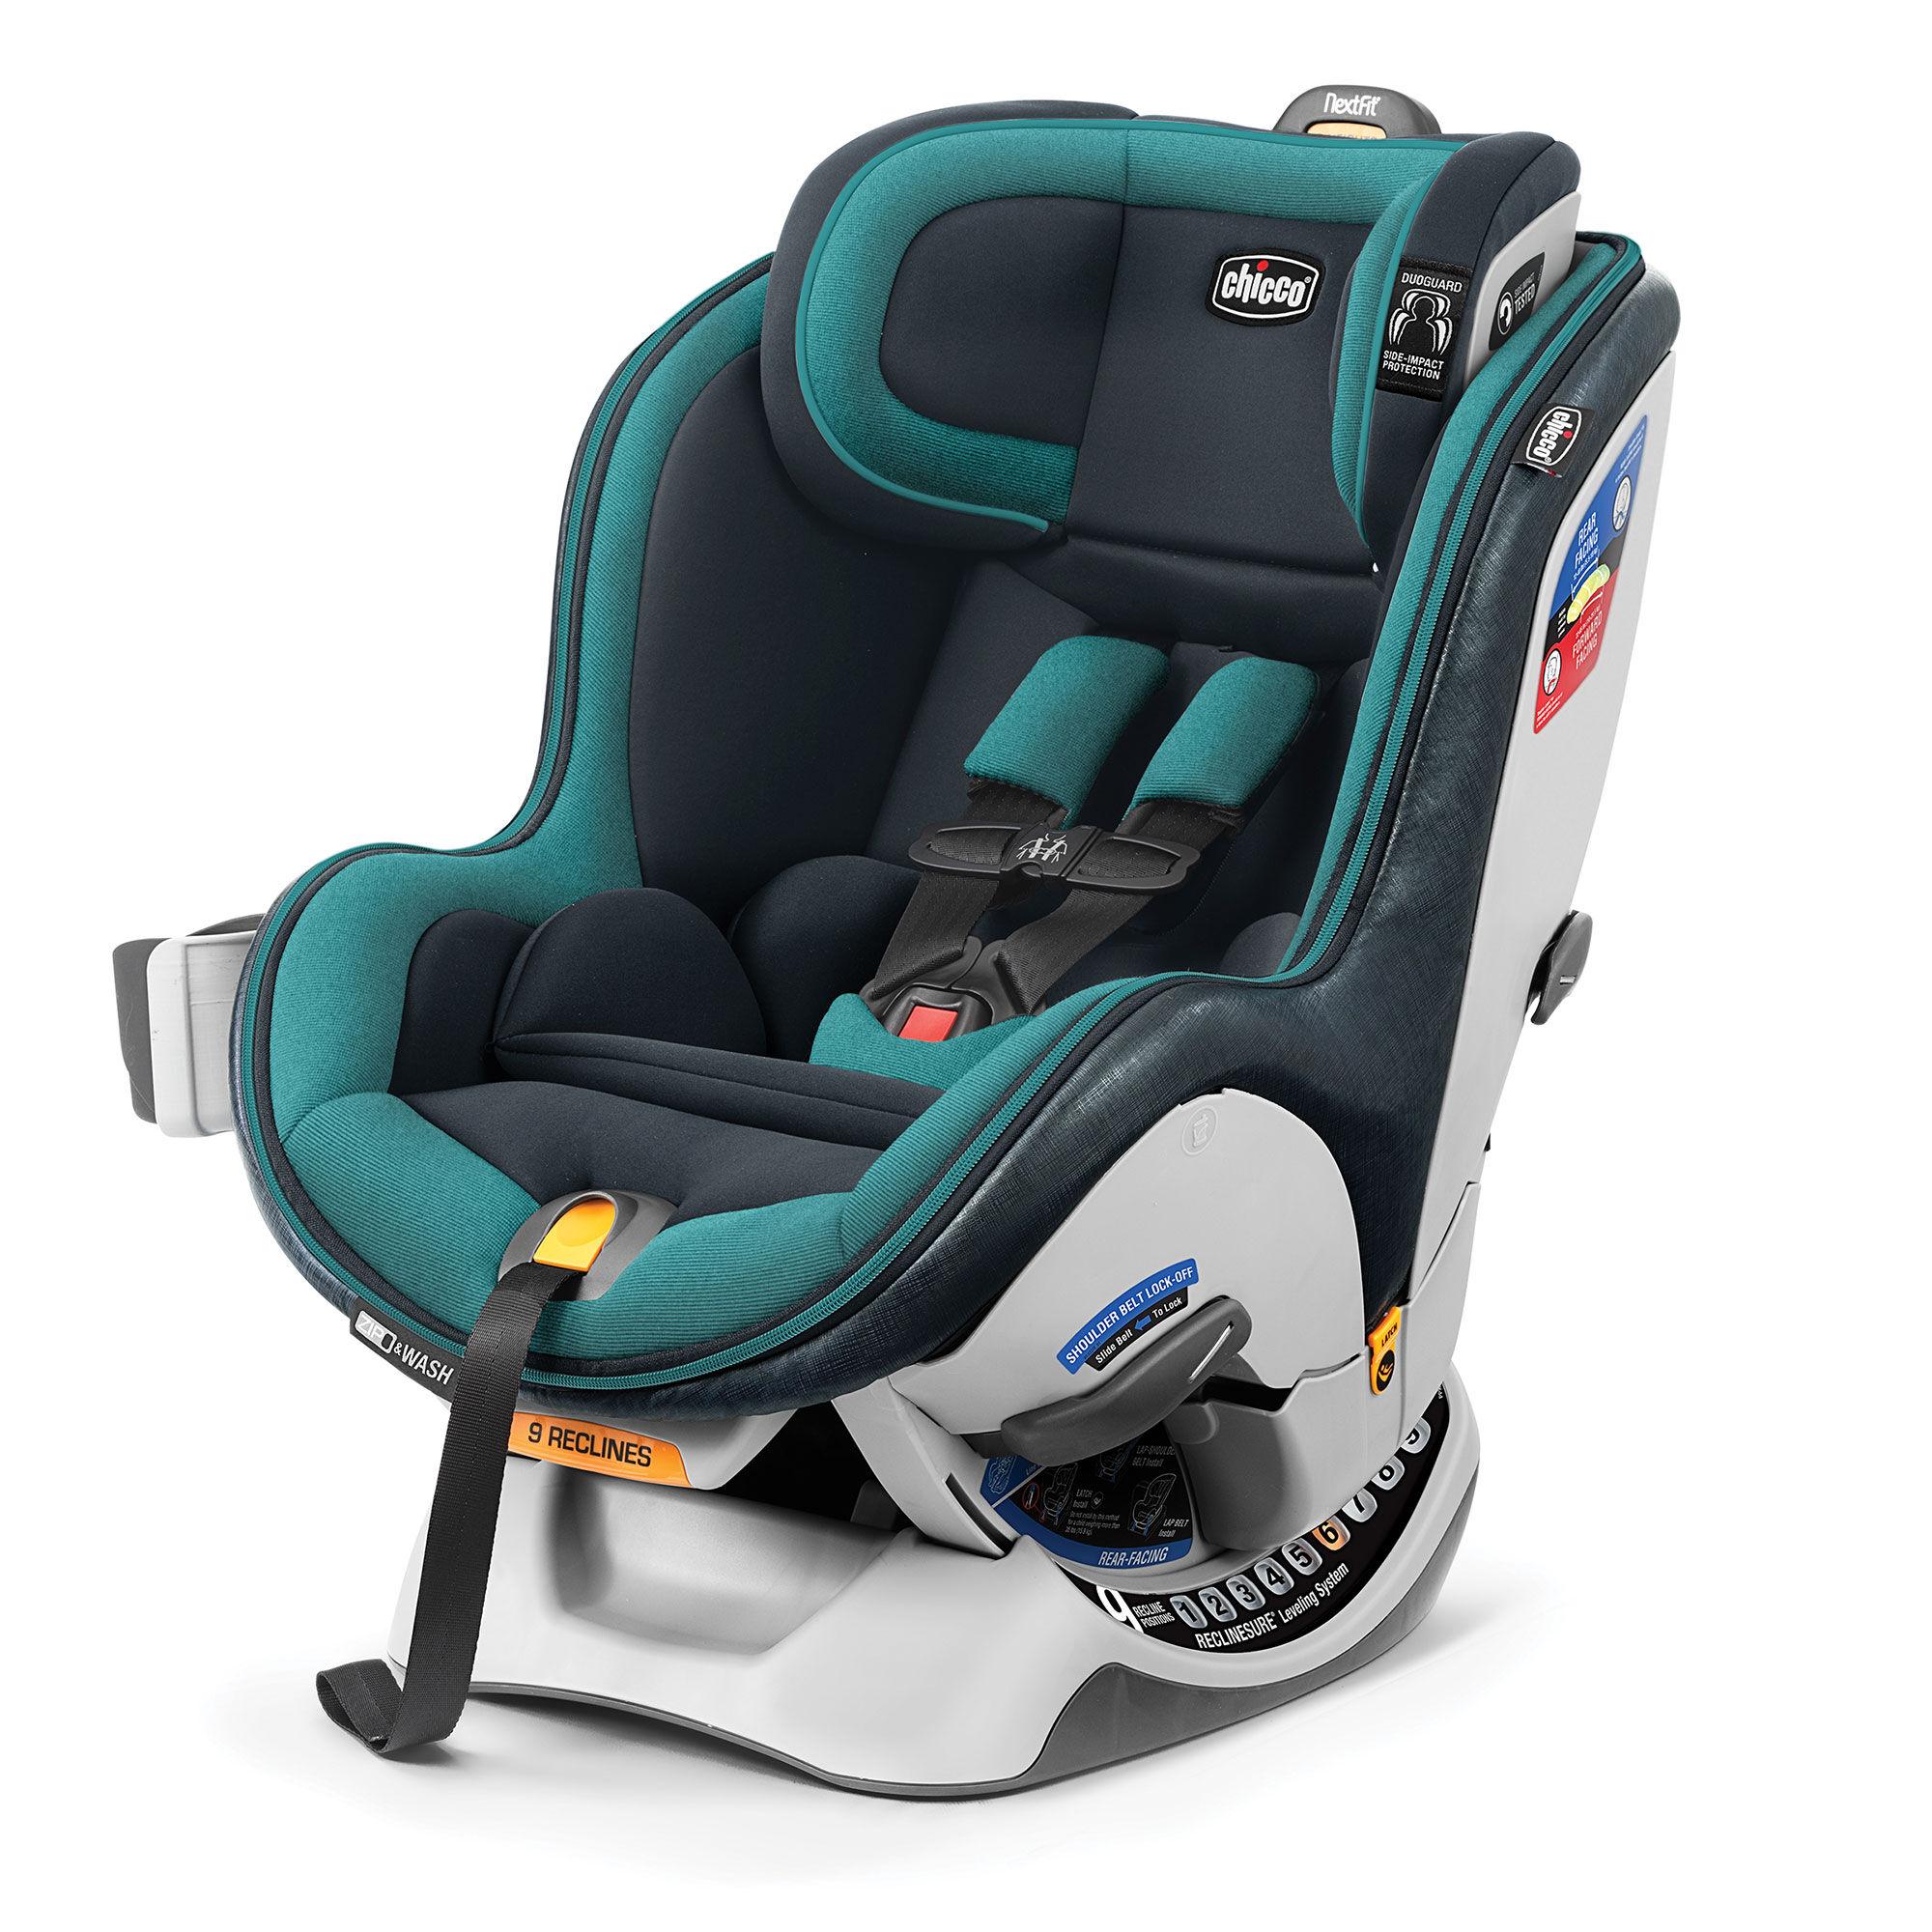 Chicco Nextfit Zip Convertible Car Seat Juniper. Nextfit Zip Convertible Car Seat Juniper In. Seat. Seat Belt Harness Zipper At Scoala.co